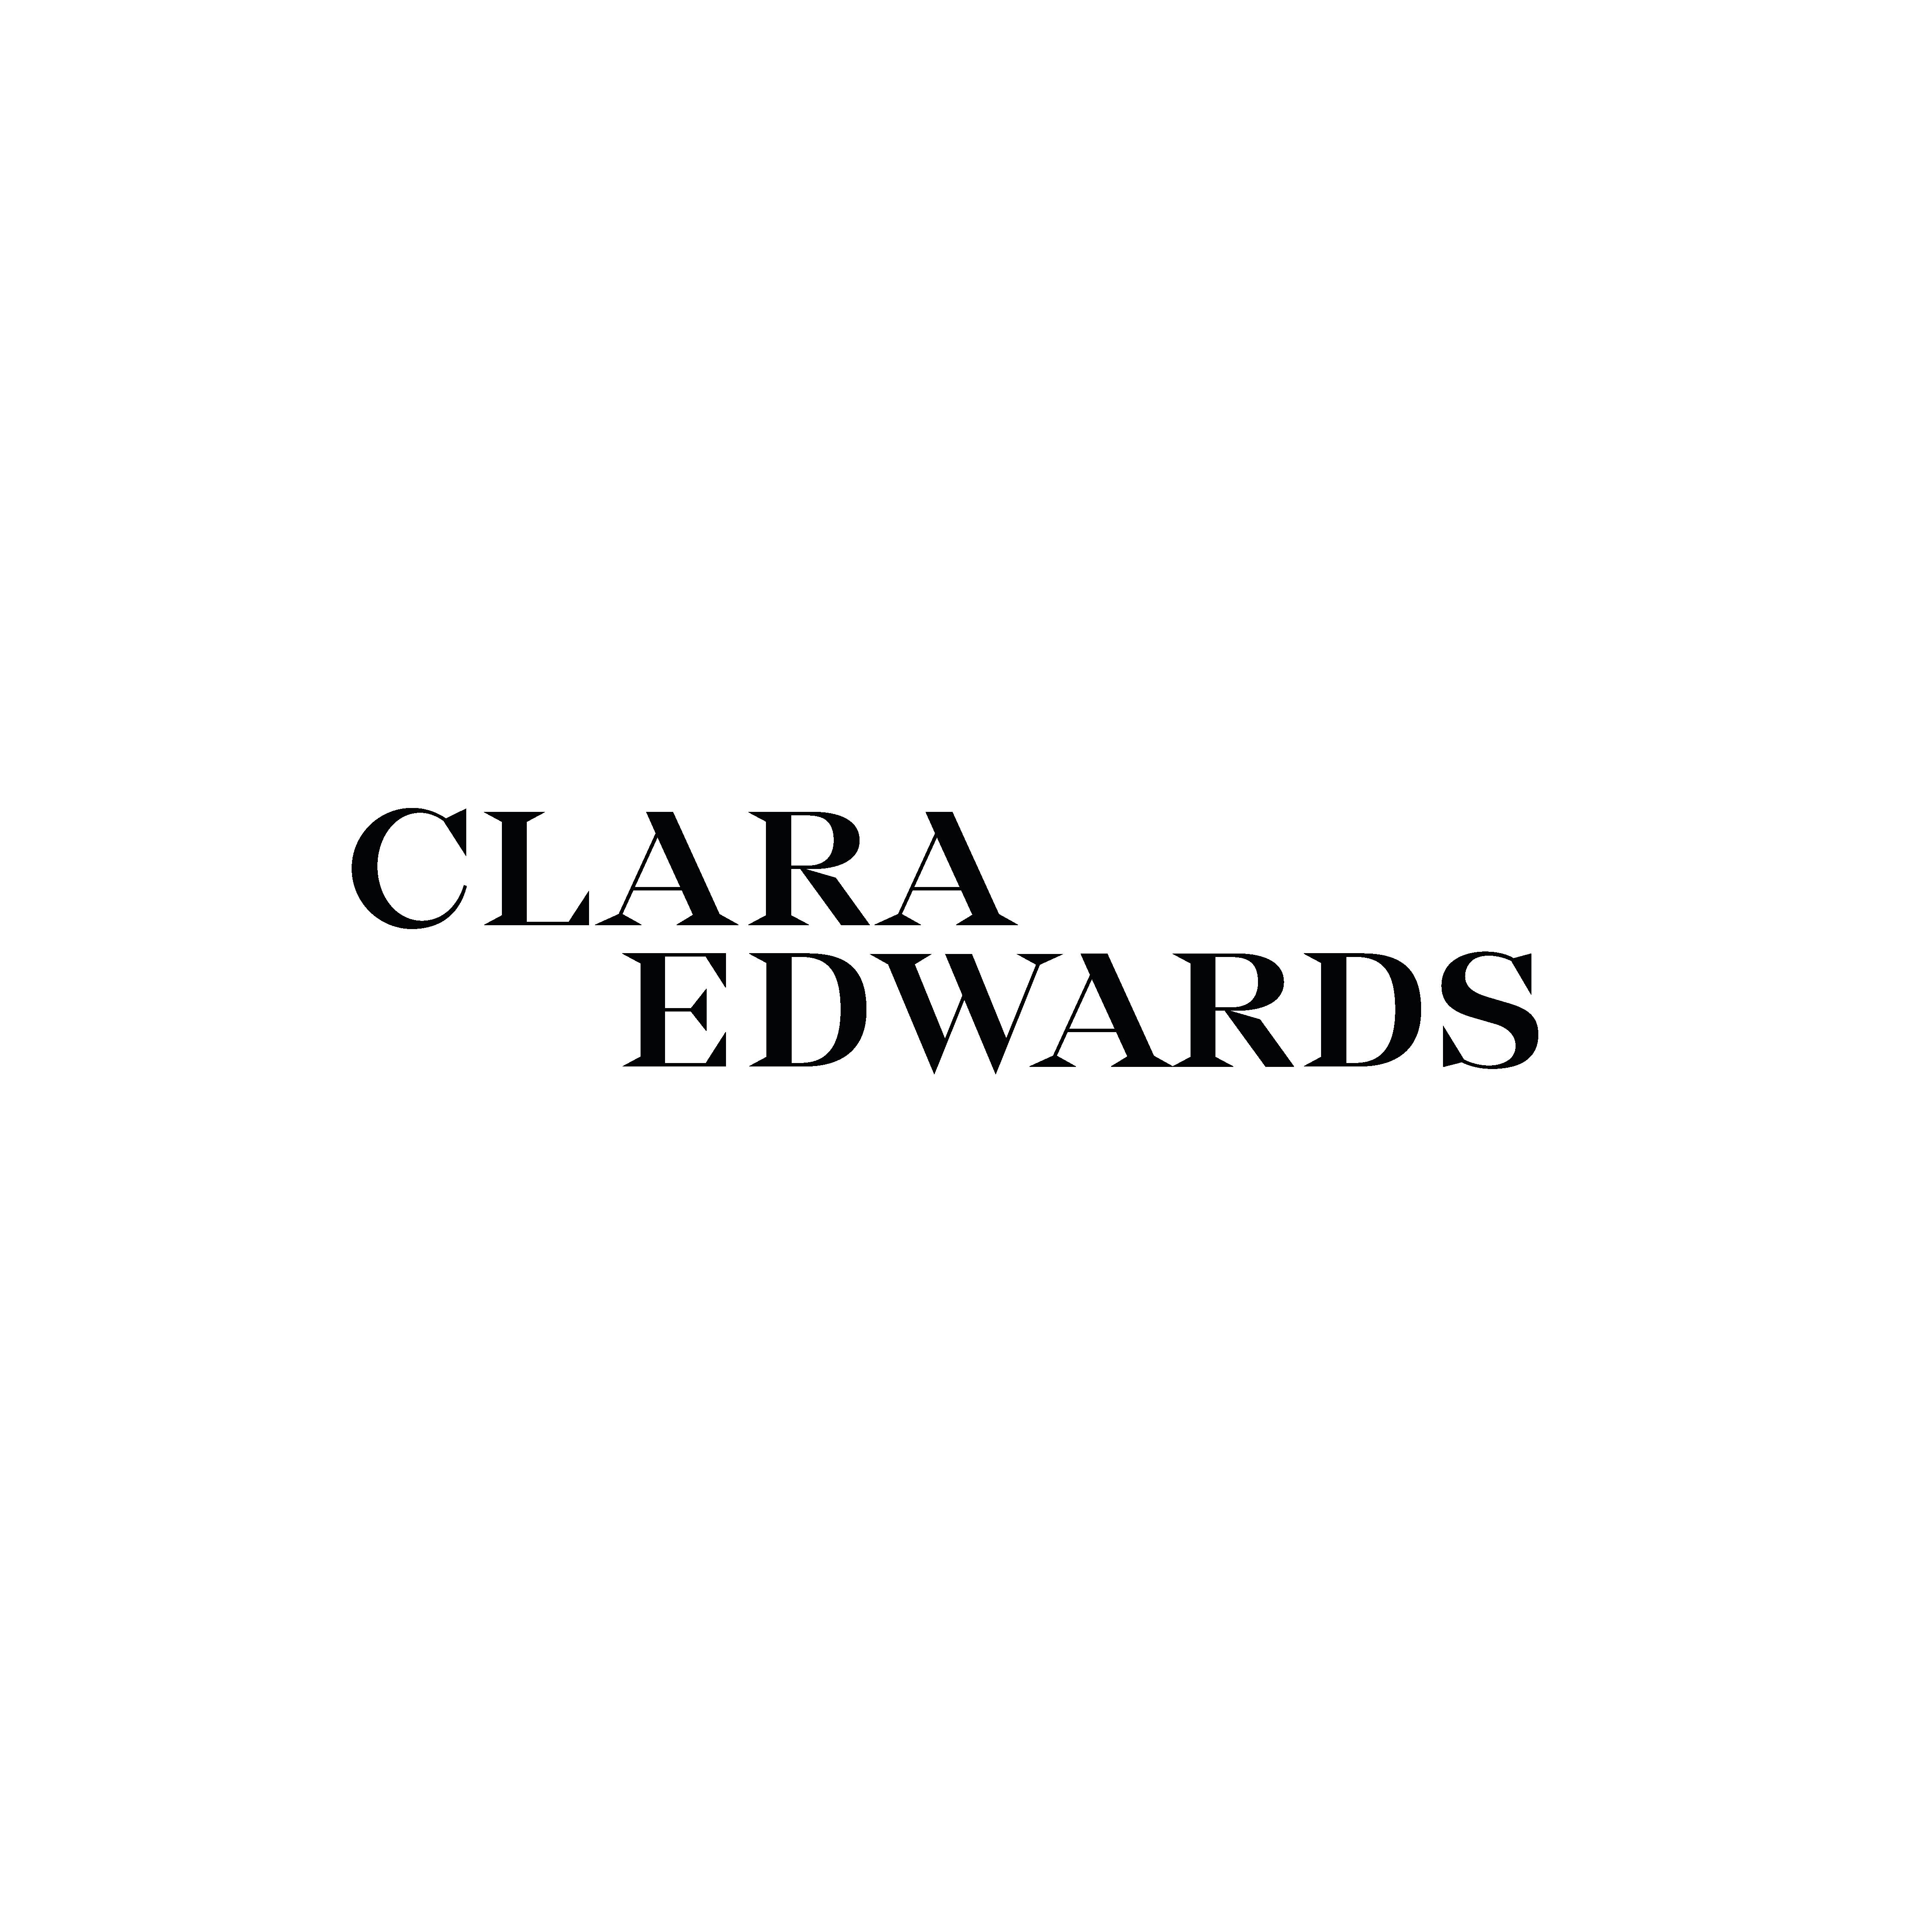 Clara Edwards